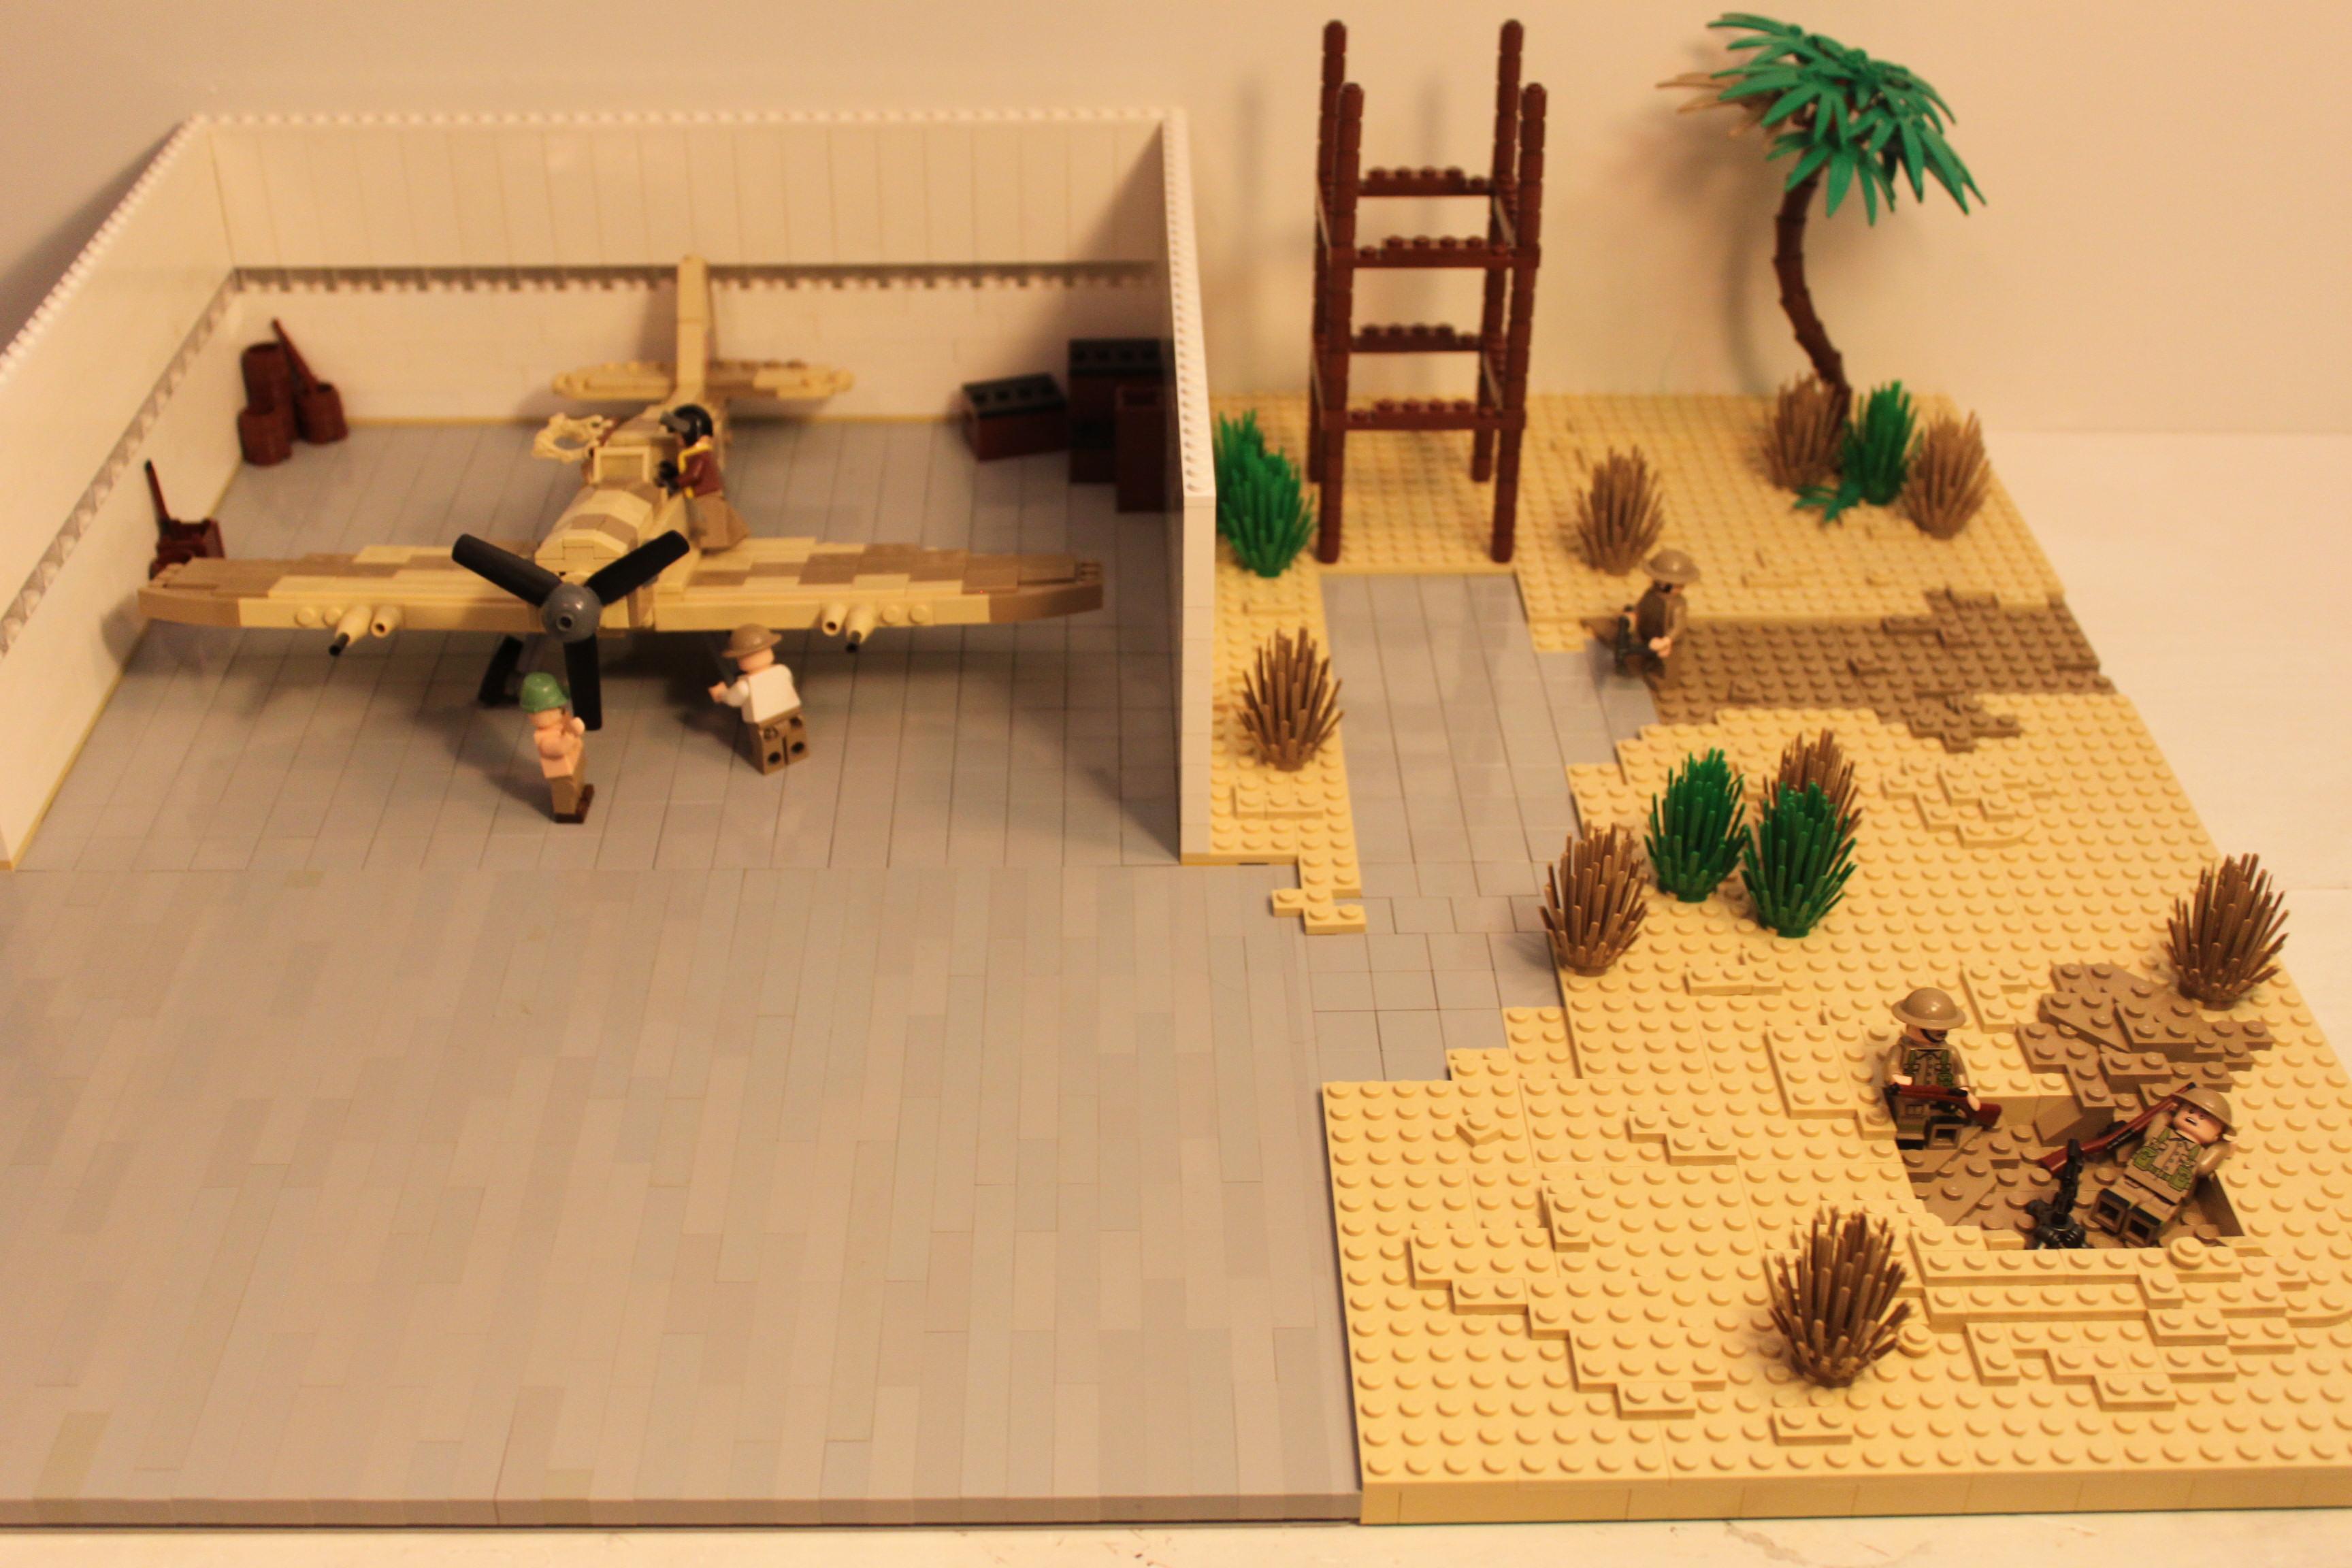 Rask Lego Træ SQ49 | Congregationshiratshalom BU-95